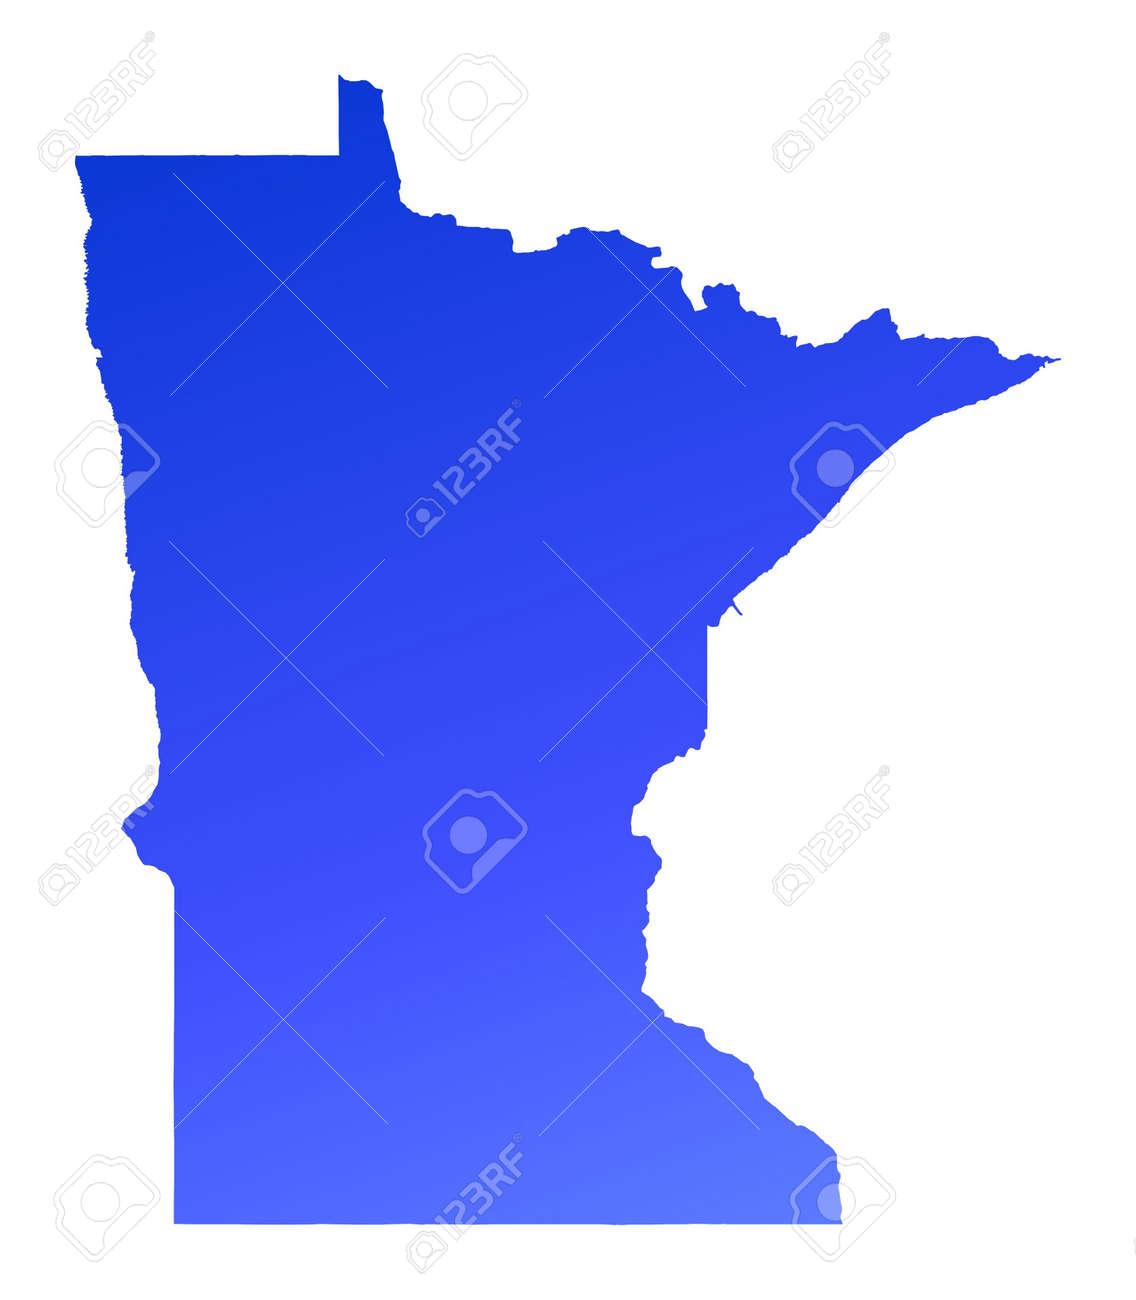 Blue gradient Minnesota map, USA. Detailed, Mercator projection.